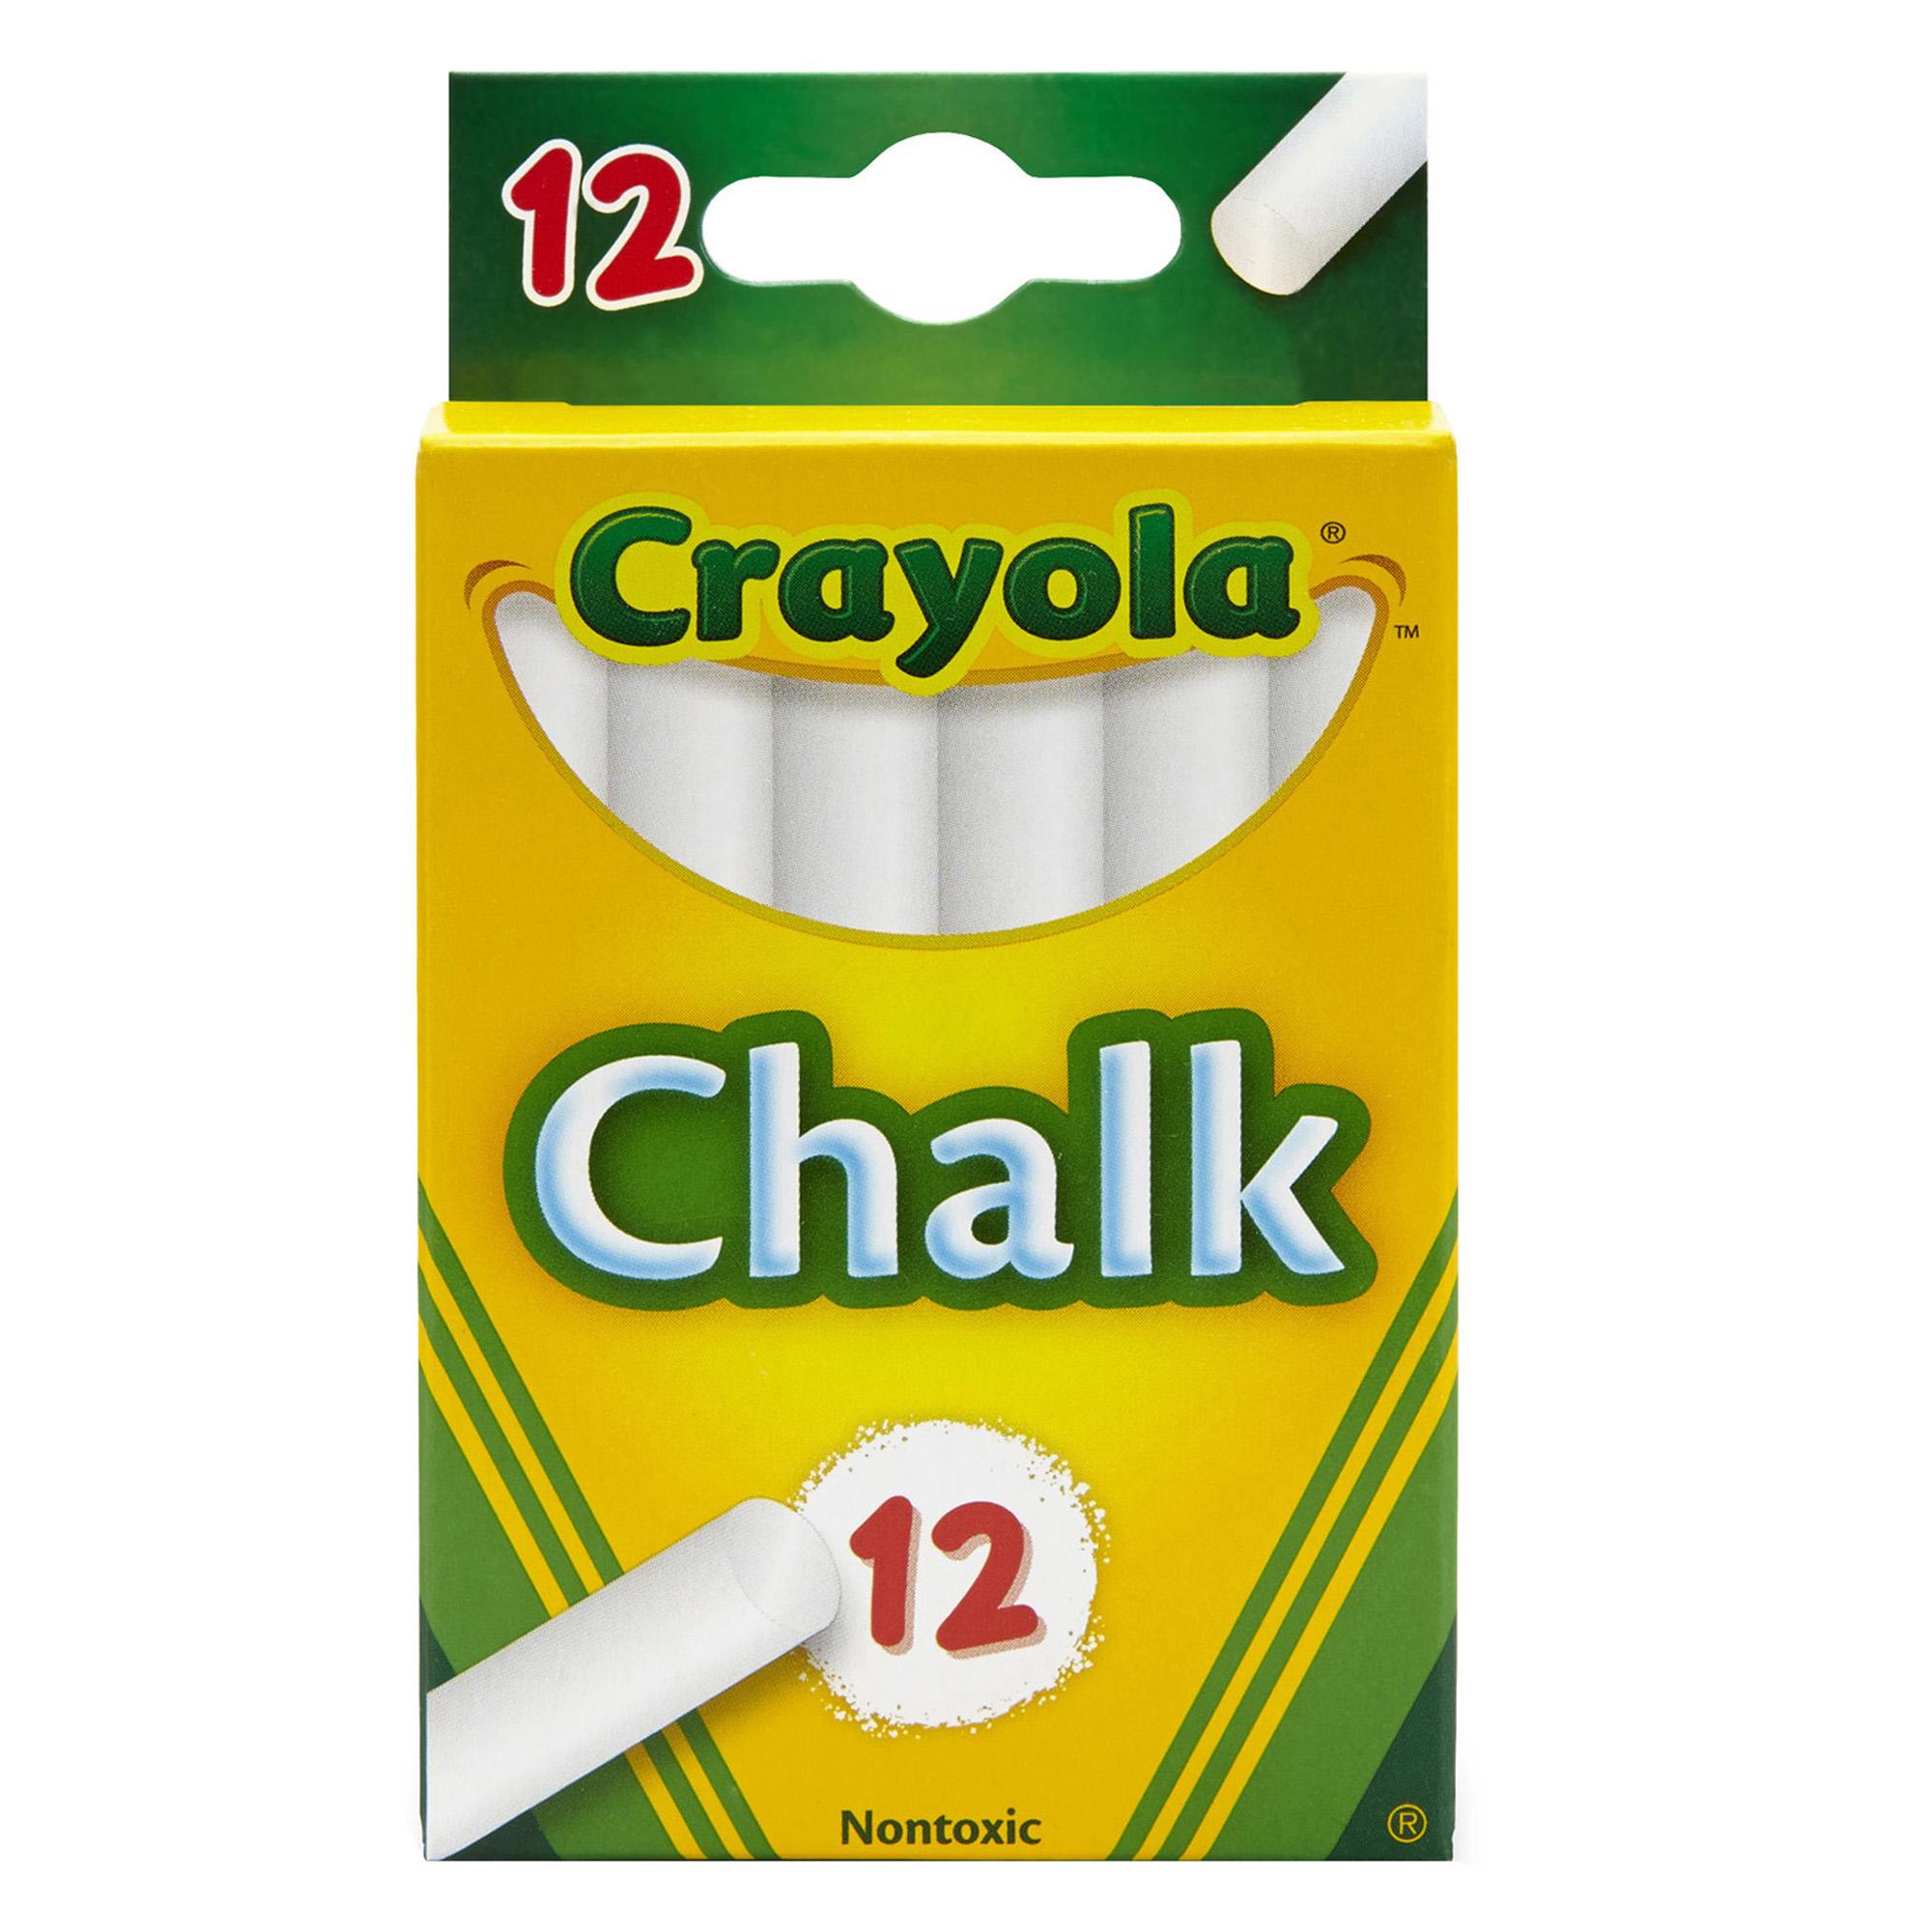 Crayola® Children's Chalk 12 sticks per box, Set of 36 boxes